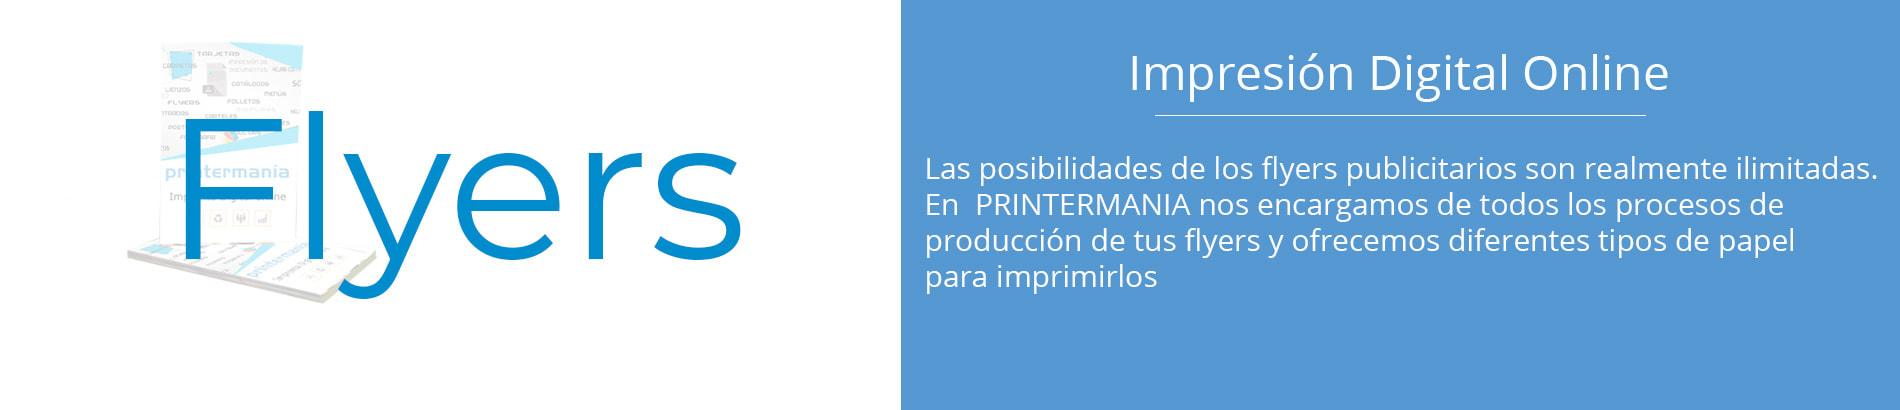 flyer printermania